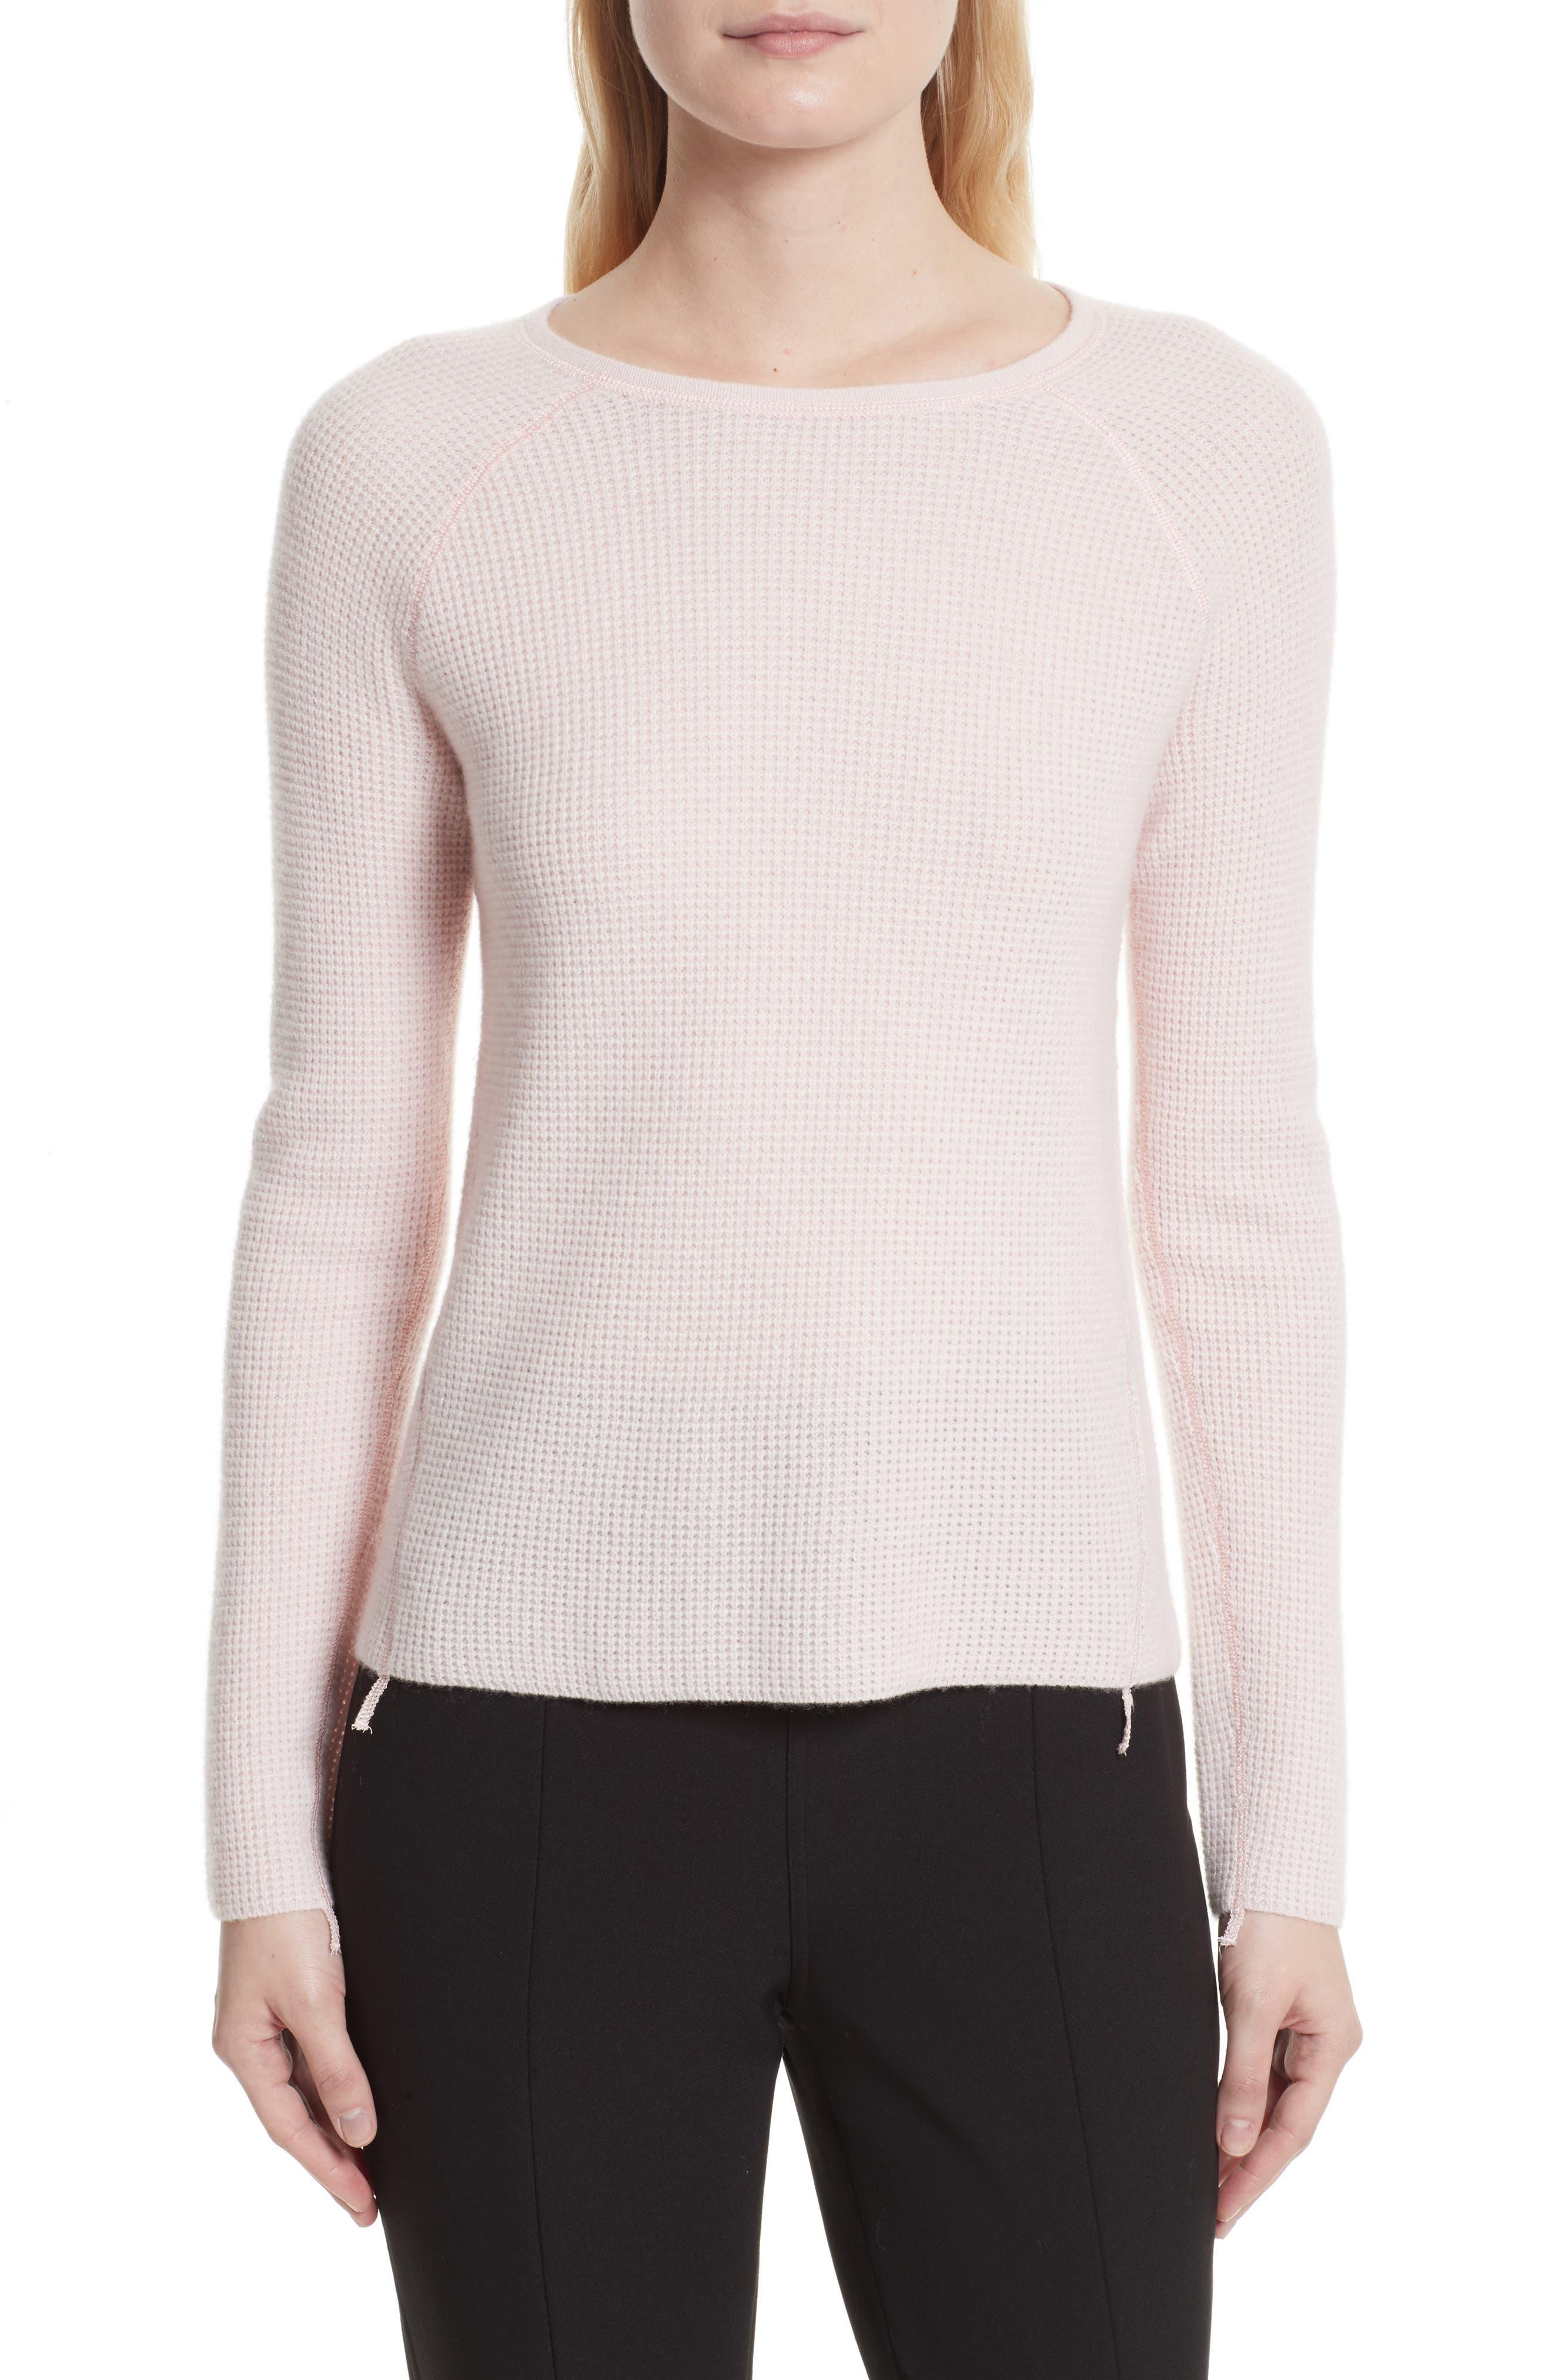 Karina Waffle Knit Cashmere Sweater,                         Main,                         color, Ballet